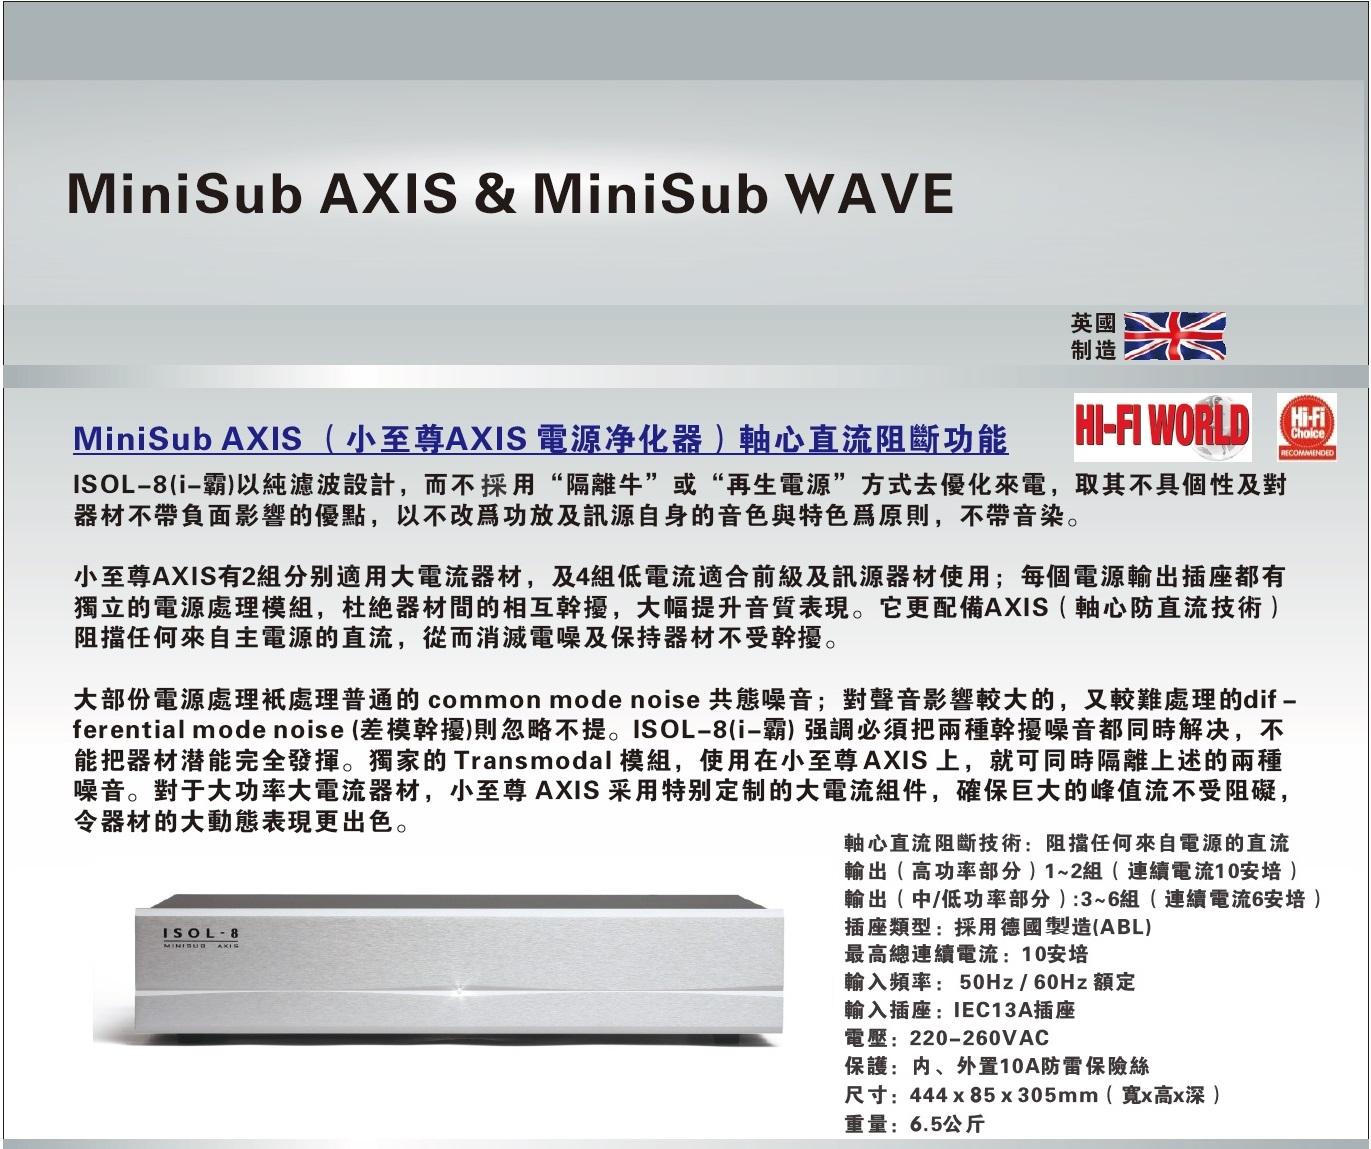 MiniSub AXIS